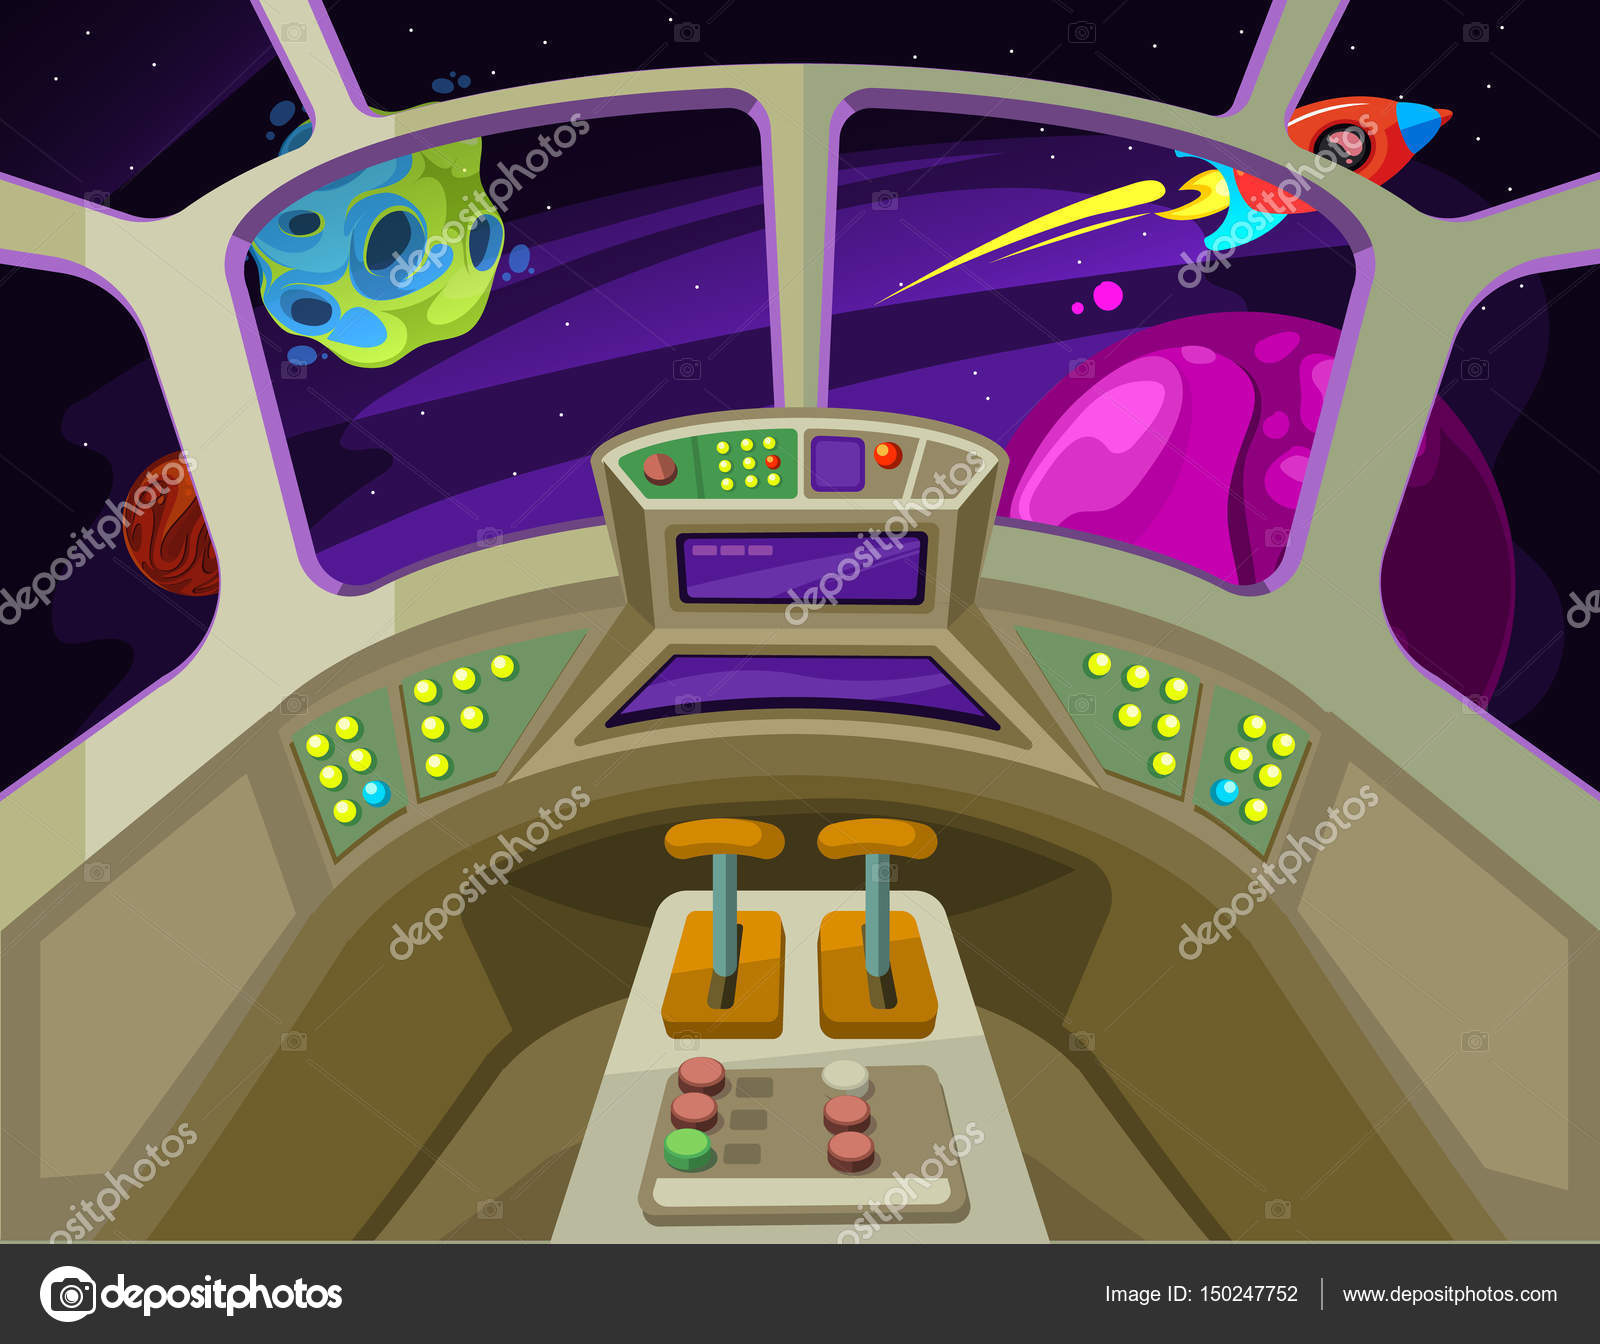 Cartoon spaceship cabin interior with windows into space